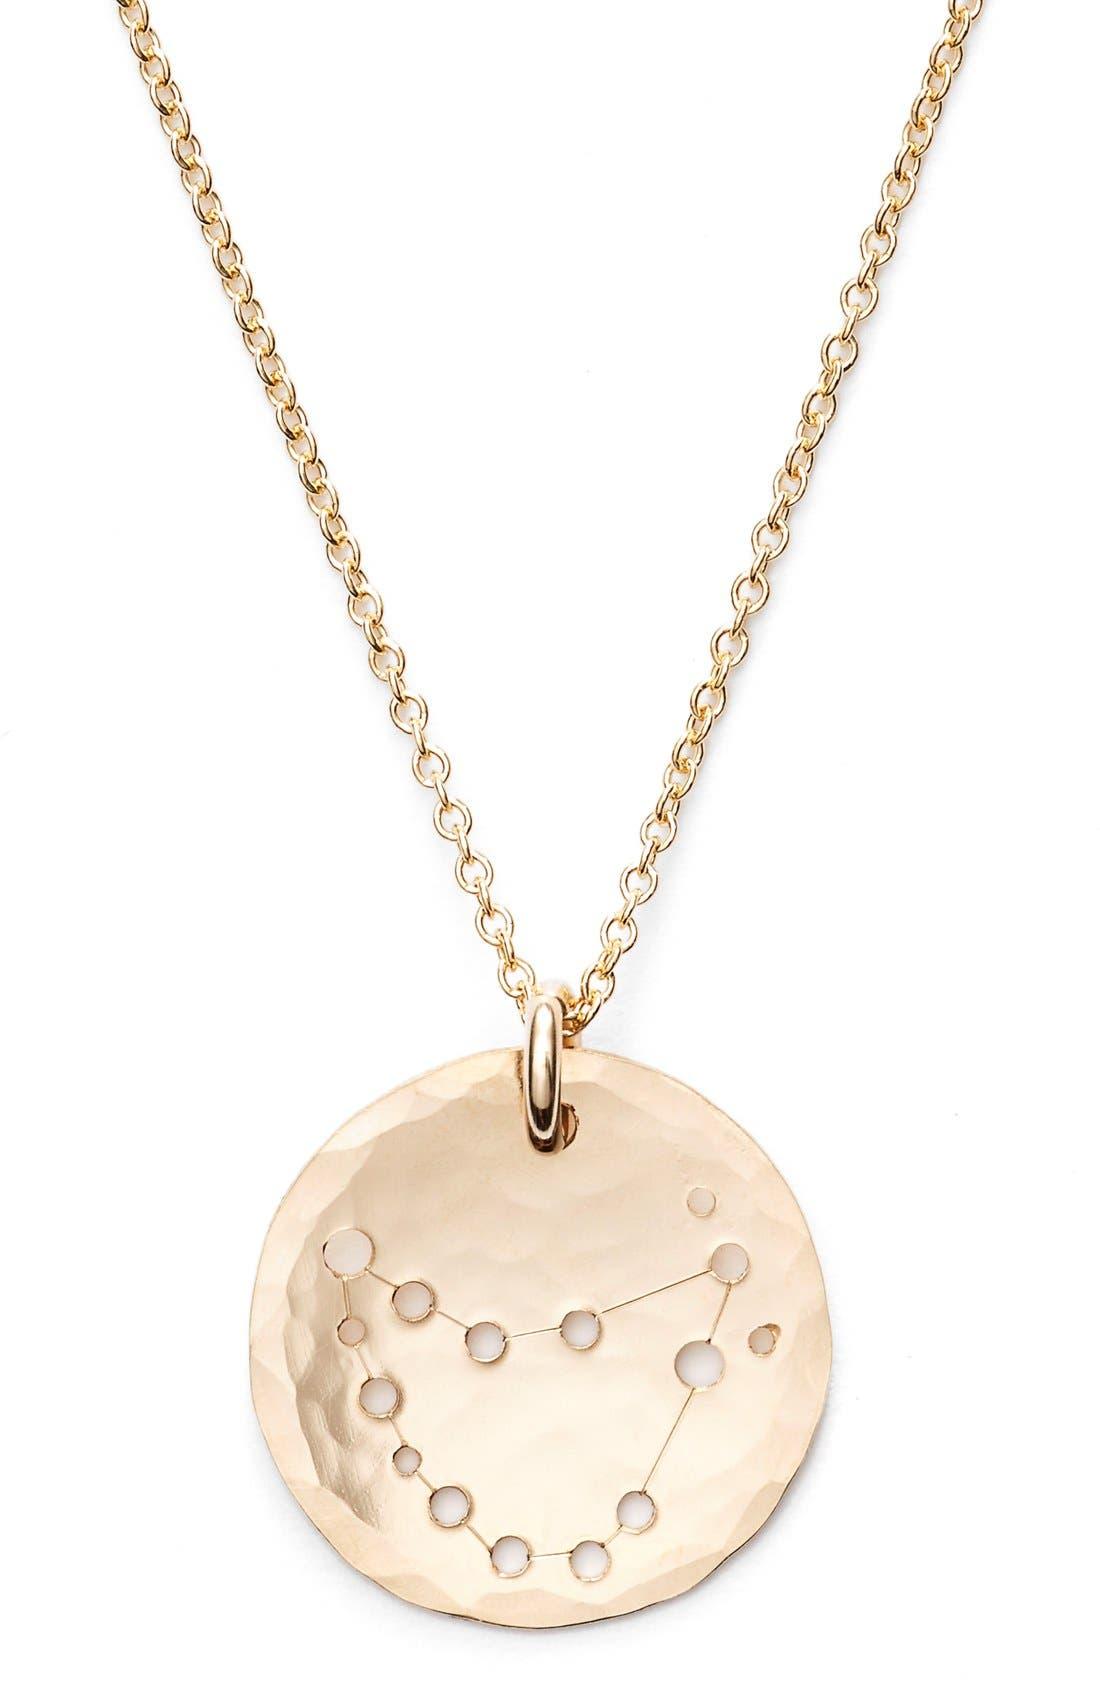 Ija 'Small Zodiac' 14k-Gold Fill Necklace,                             Alternate thumbnail 34, color,